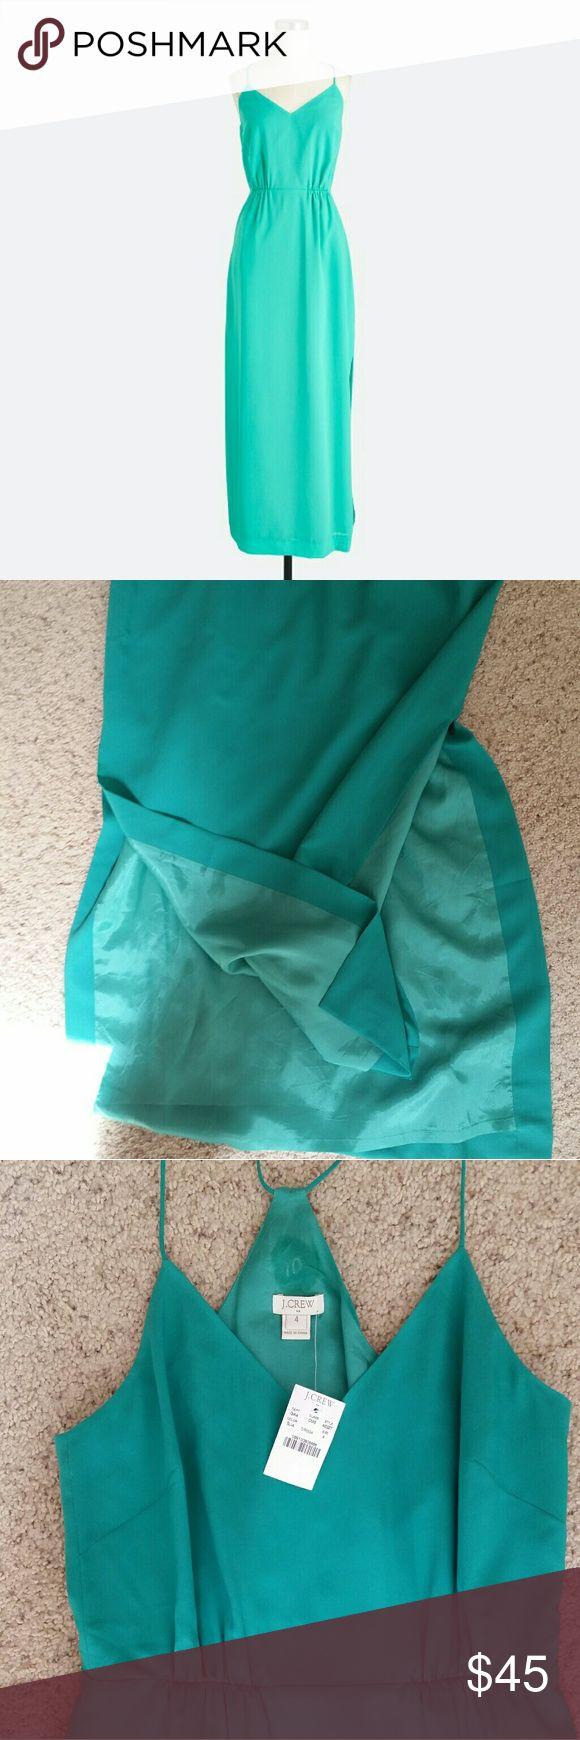 I just added this listing on Poshmark: J. Crew teal maxi dress size 4. #shopmycloset #poshmark #fashion #shopping #style #forsale #J. Crew #Dresses & Skirts